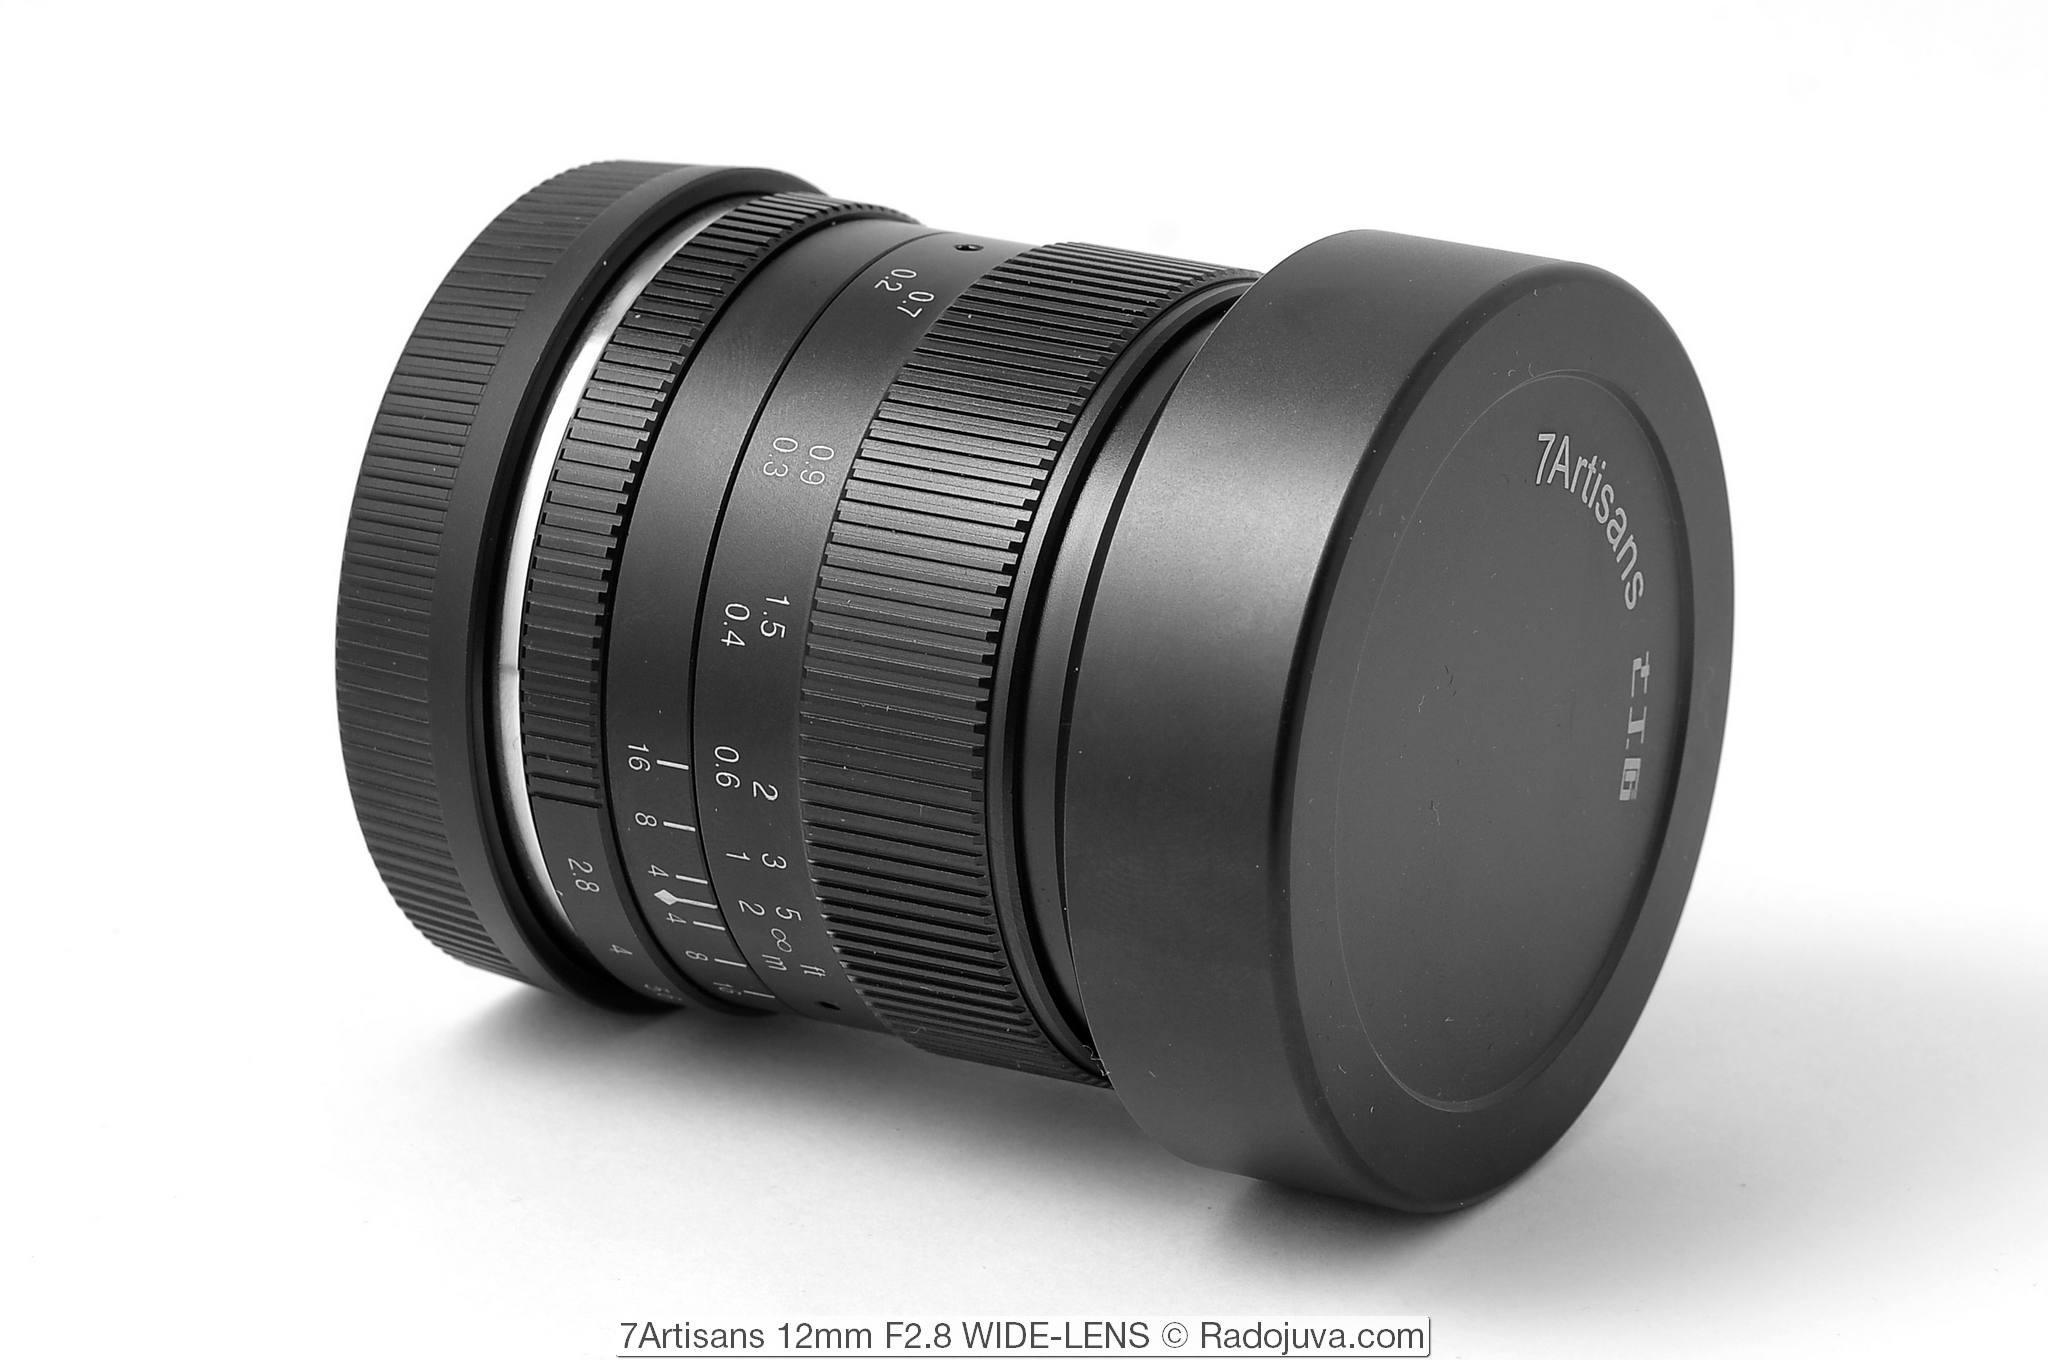 7Artisans 12mm F2.8 WIDE-LENS